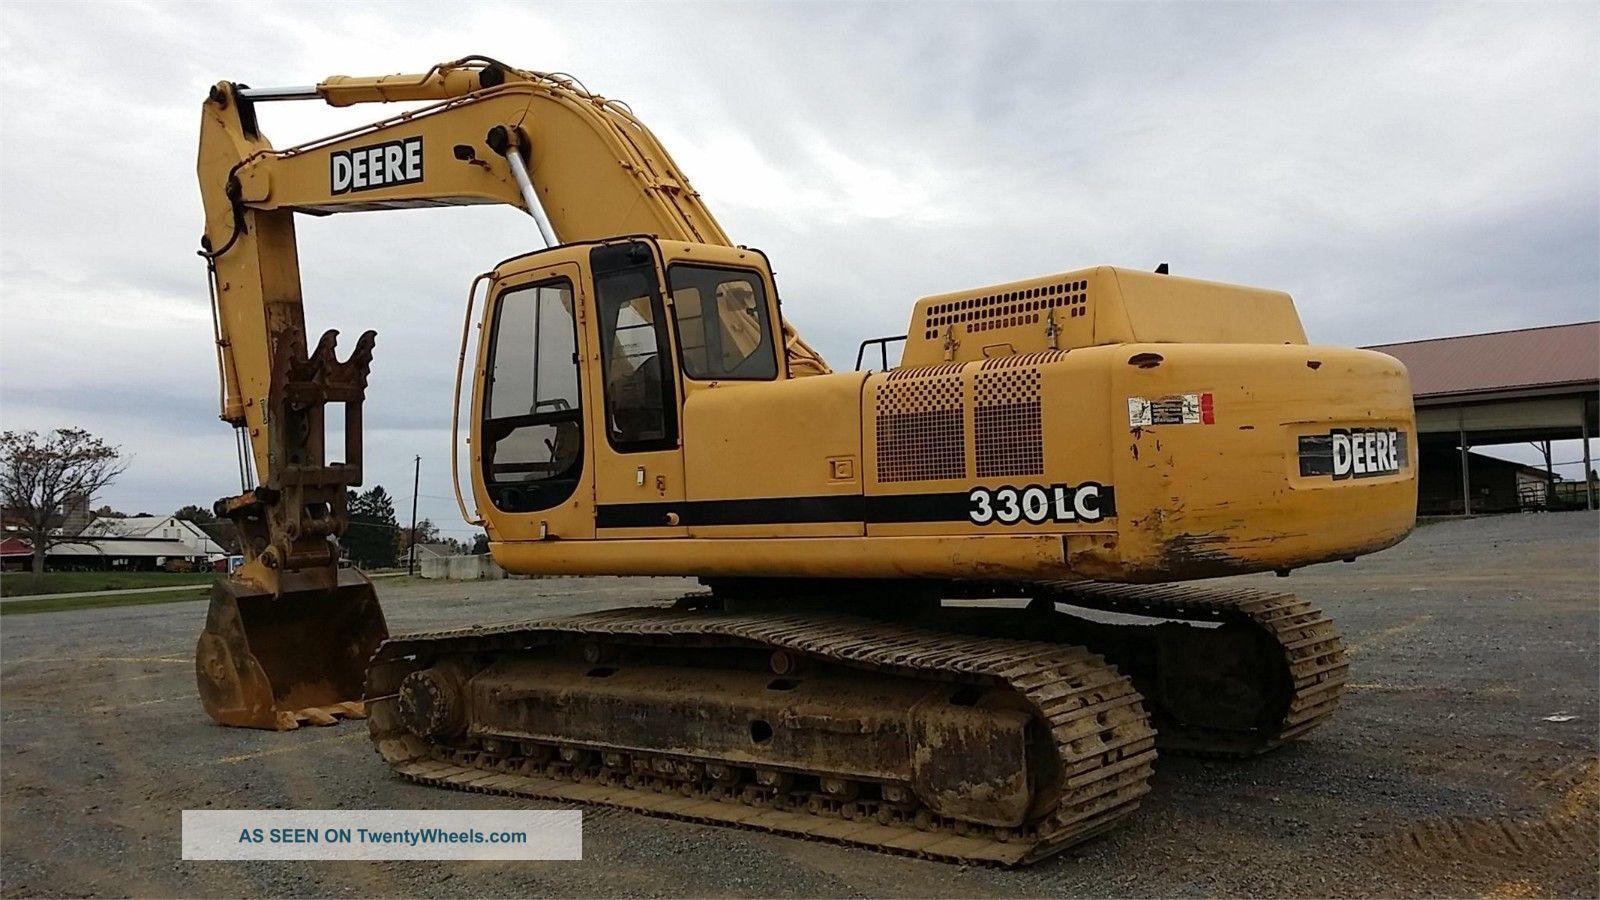 2000 John Deere 330 Lc Hydraulic Construction Excavator ...